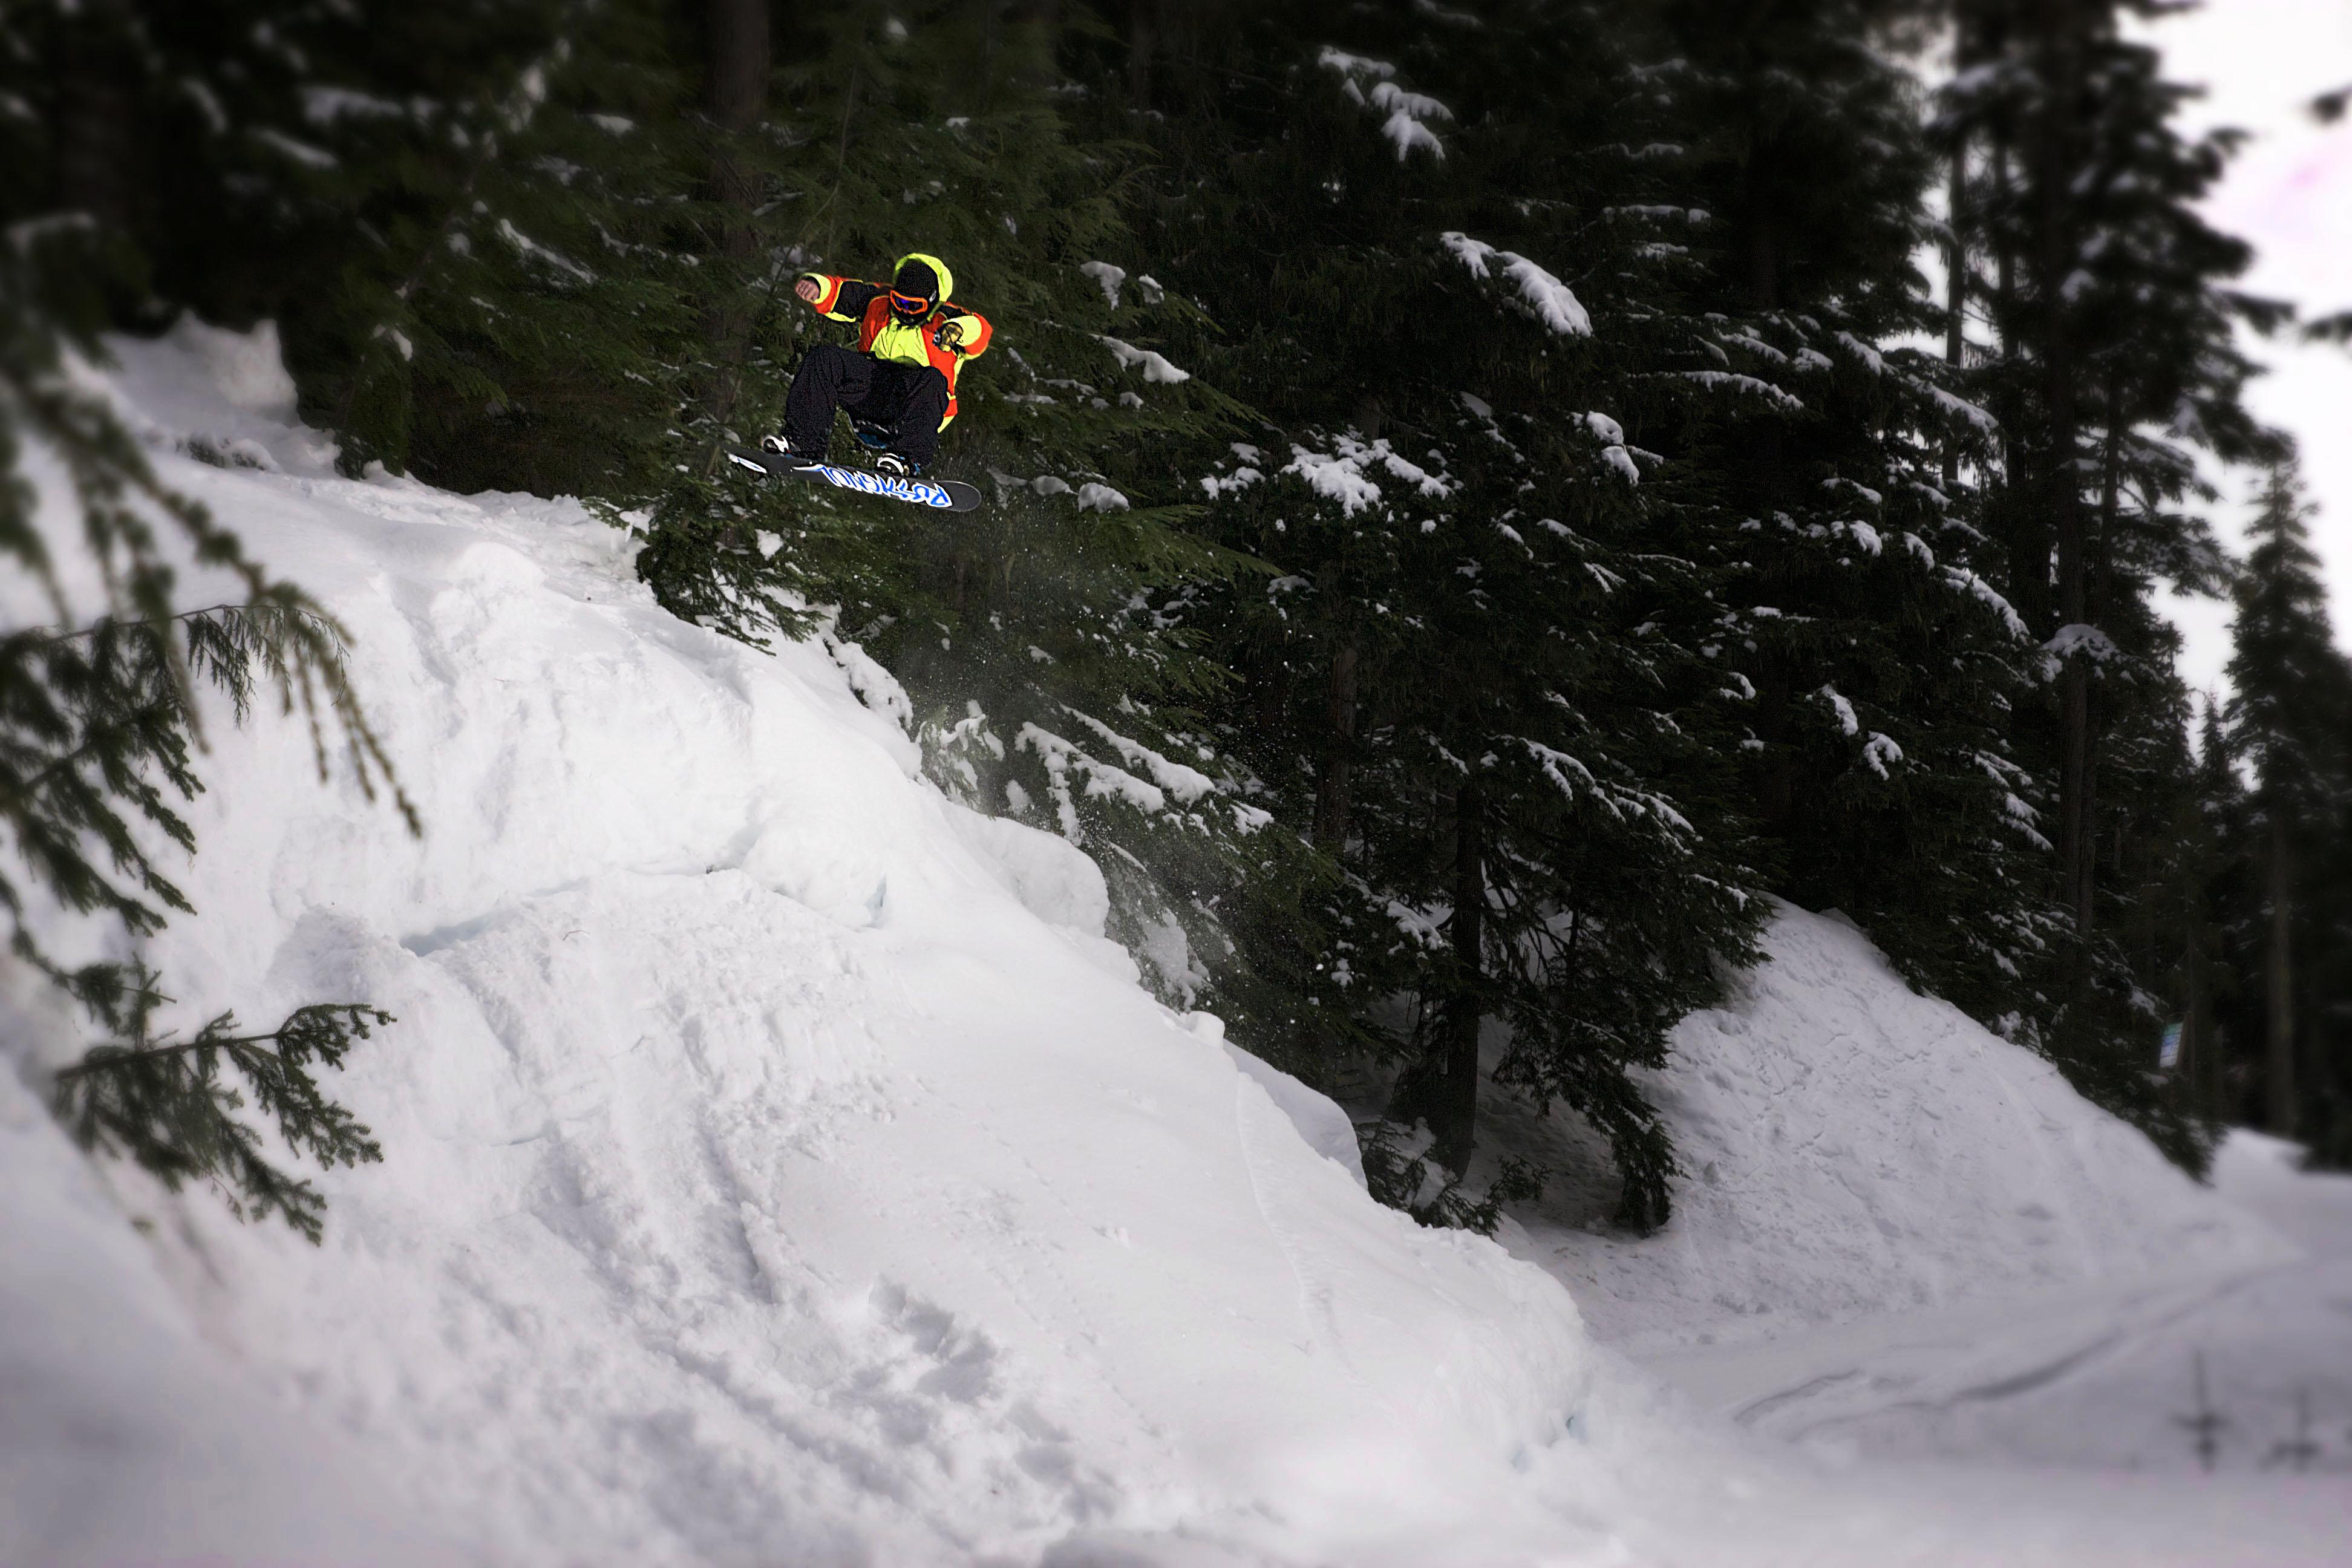 snowboard course